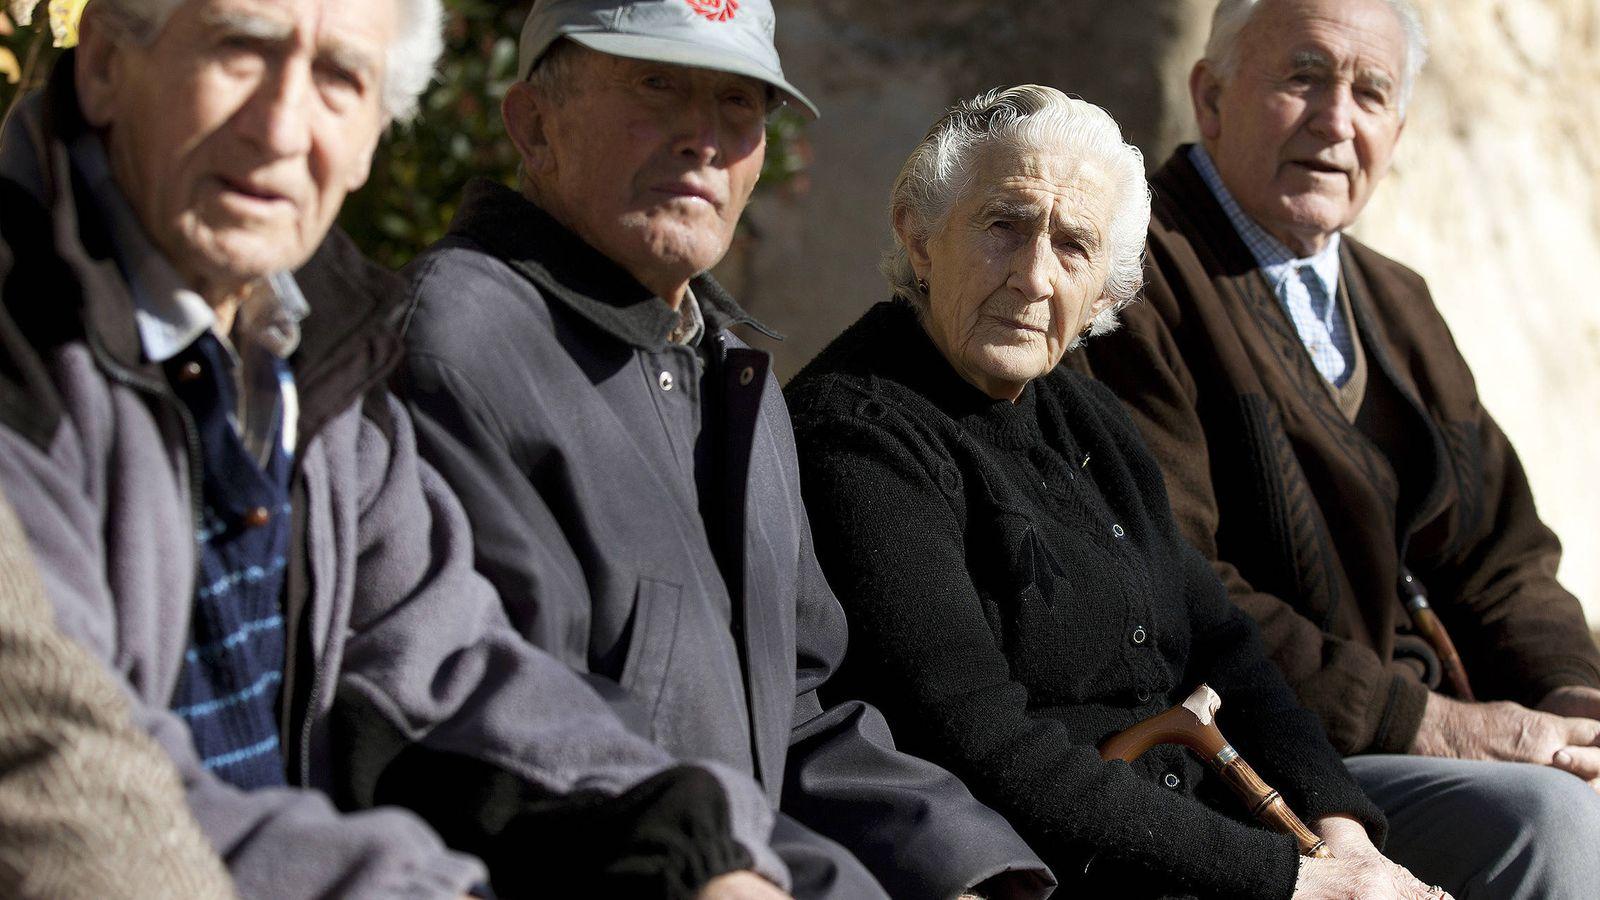 4 Viejos españa no es país para viejos (que huelen)